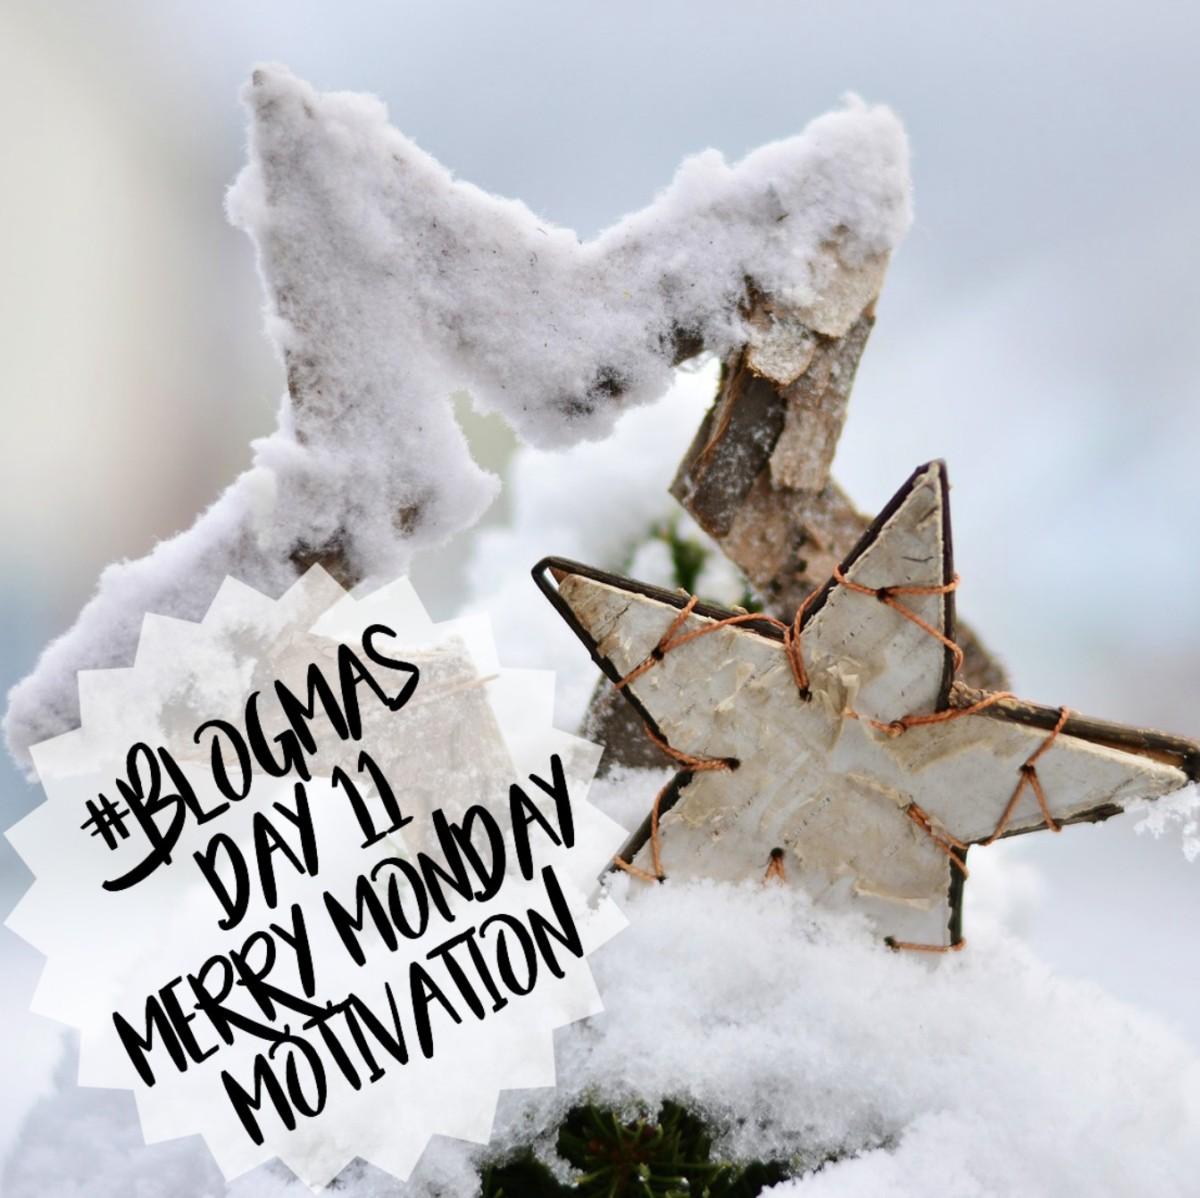 Monday, Monslay, Monday Motivation, Merry Monday Motivation, Motivation, Motivational, Determination, Determined, Slay, Slay the day, Snow, BLOGMAS Day 11 - Merry Monday Motivation, BlogMas, Blog A Book Etc, Fay